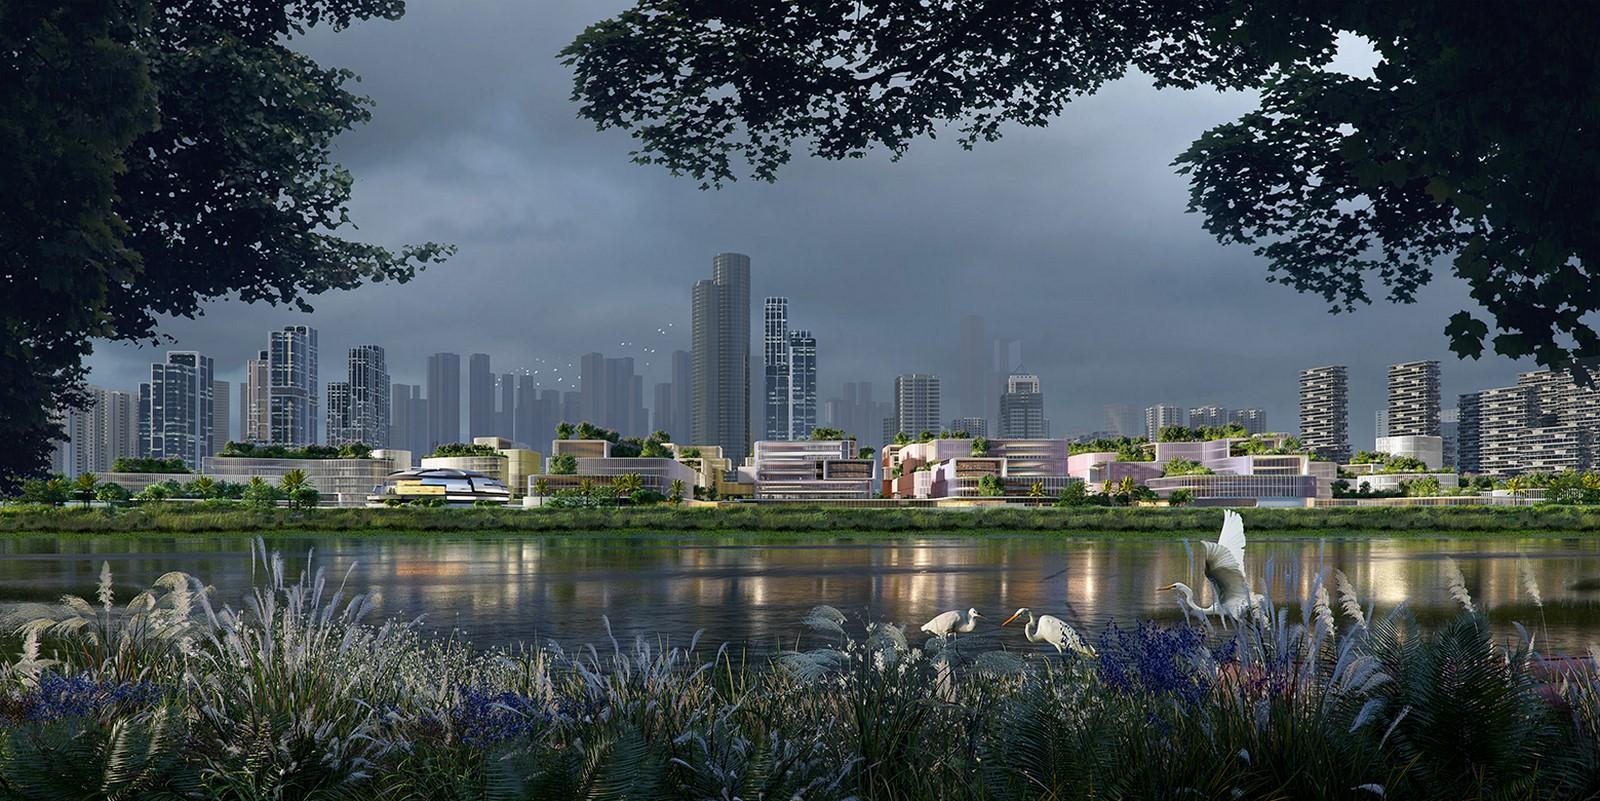 Huanggang Port Area in Shenzhen, China regenerated by Zaha Hadid Architects - Sheet2